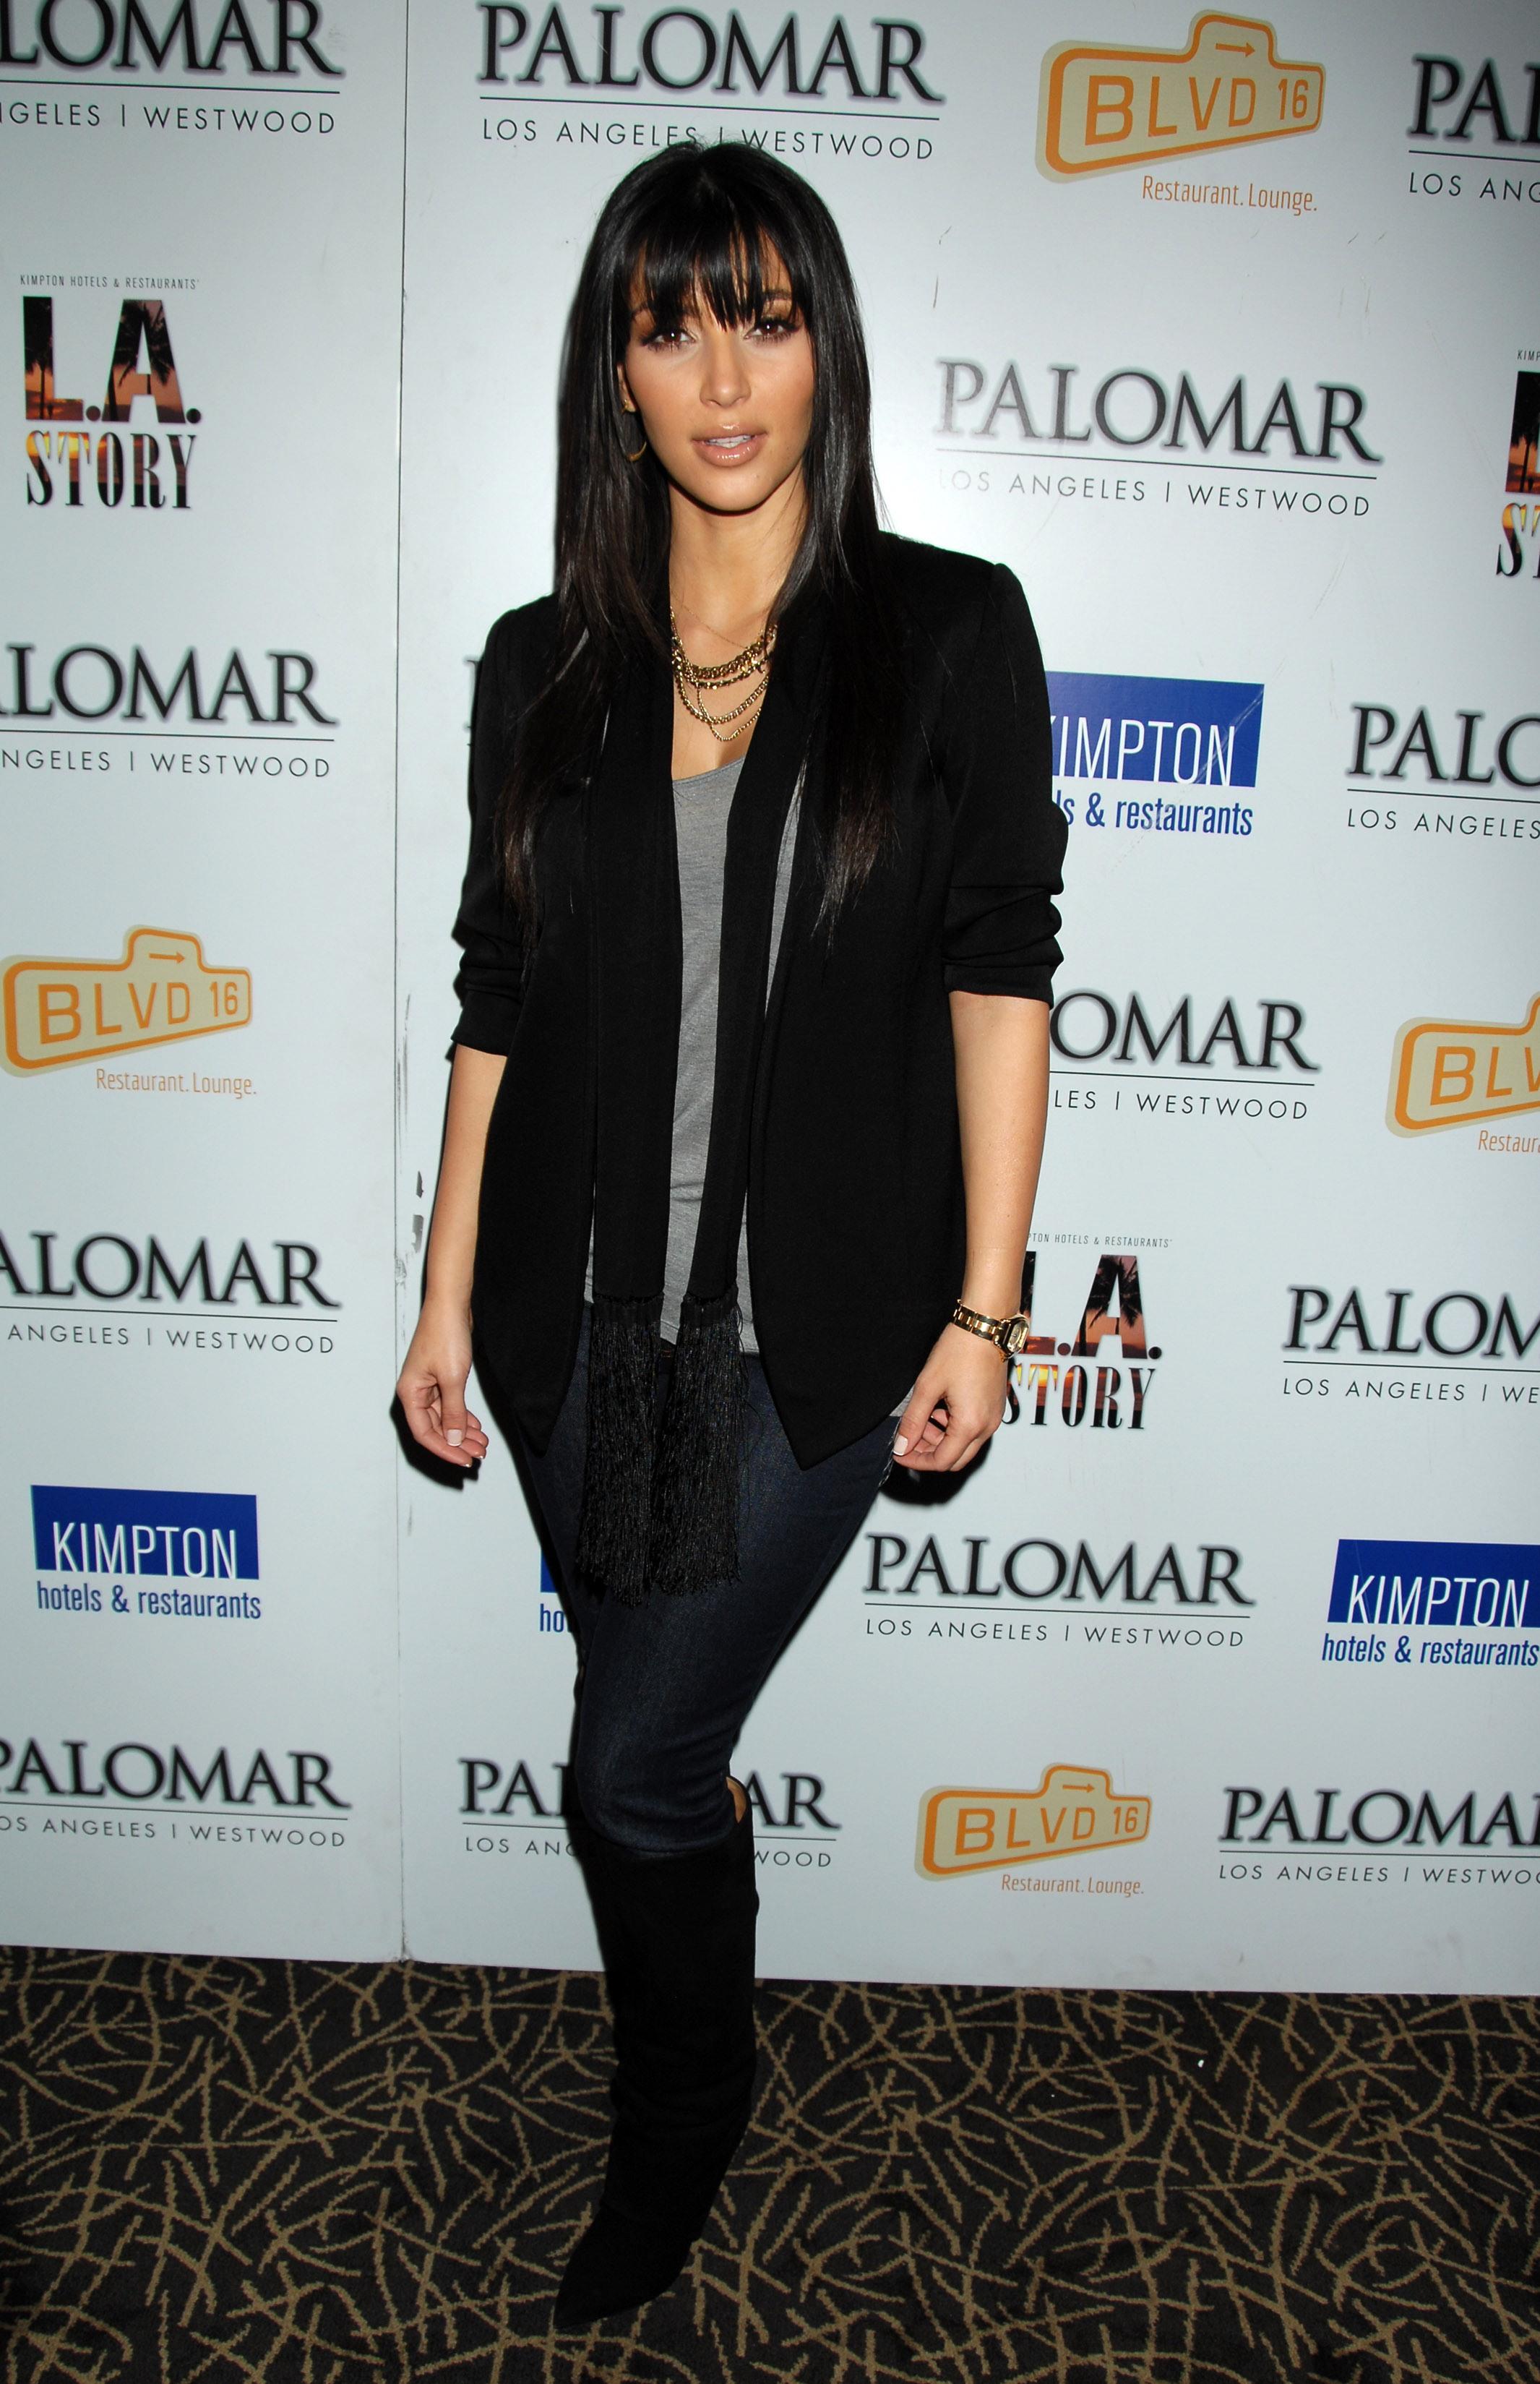 03305_Kim_Kardashian_2008-12-08_-_A_Night_For_Change_benefiting_Alternative_Intervention_Models_in_LA_248_122_695lo.jpg